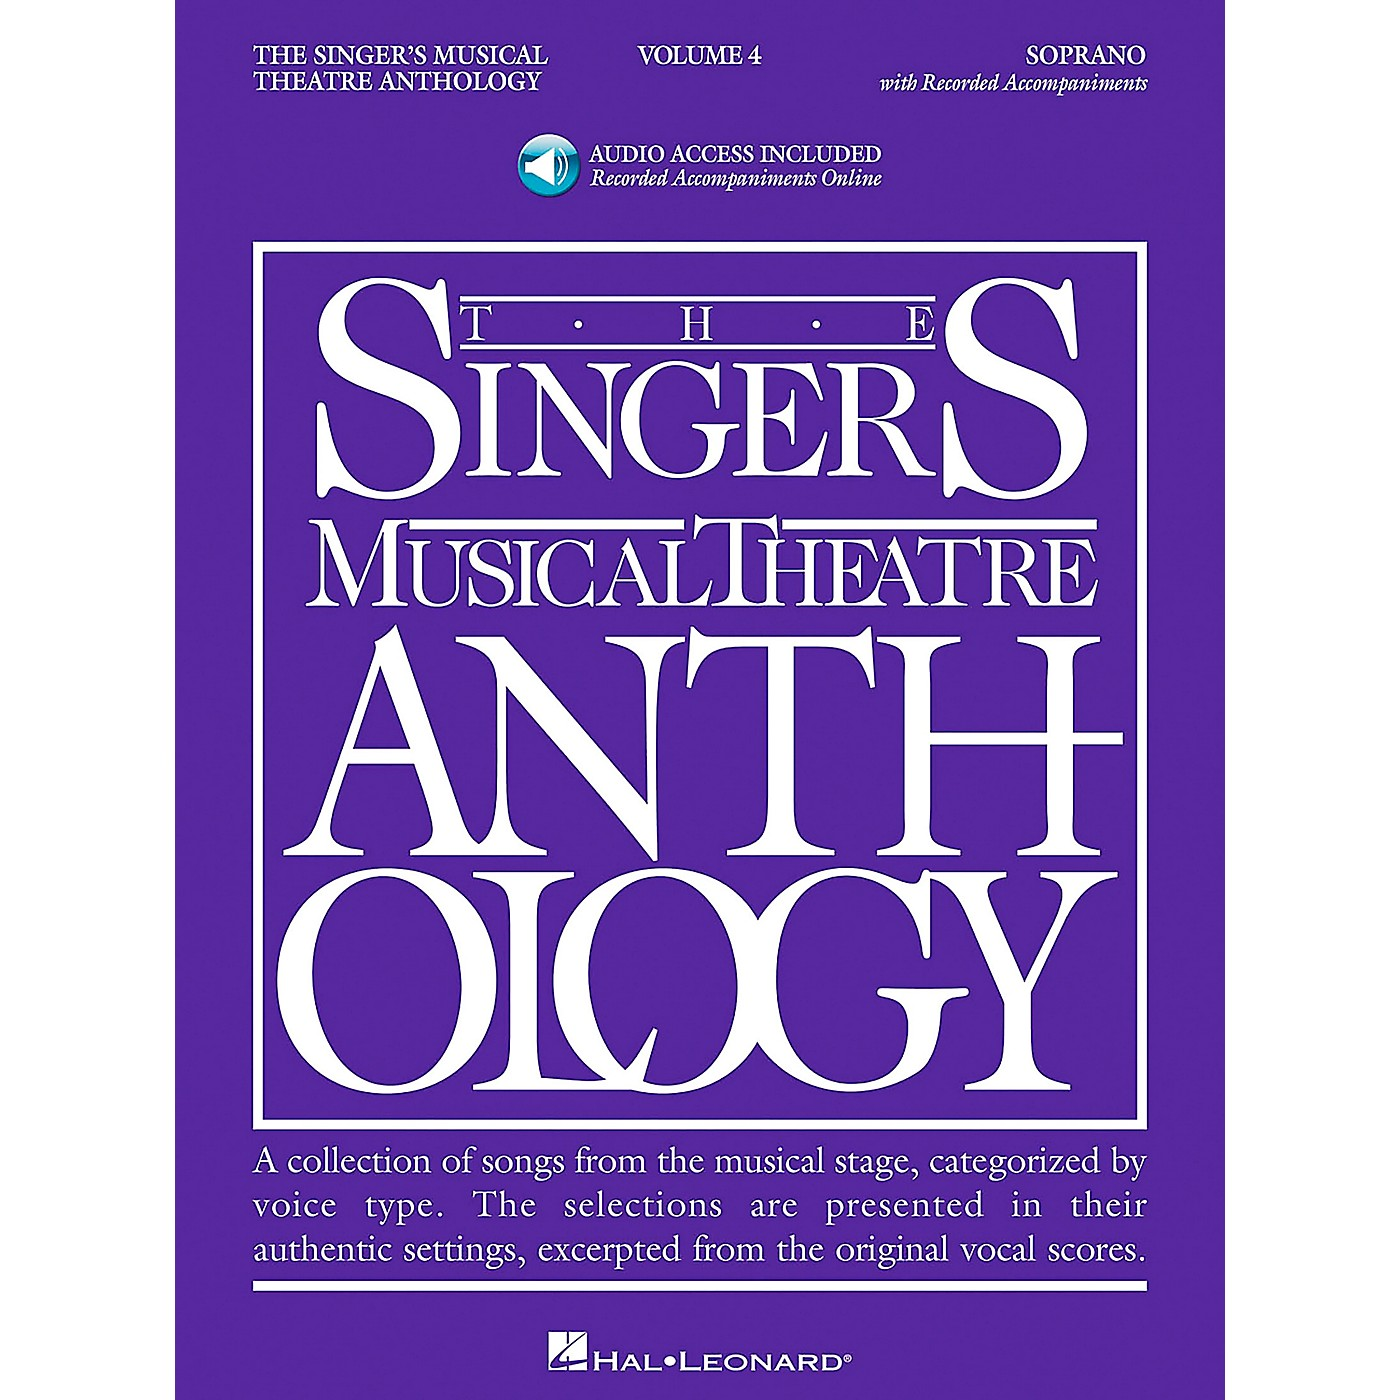 Hal Leonard Singer's Musical Theatre Anthology for Soprano Volume 4 Book/2CD's thumbnail